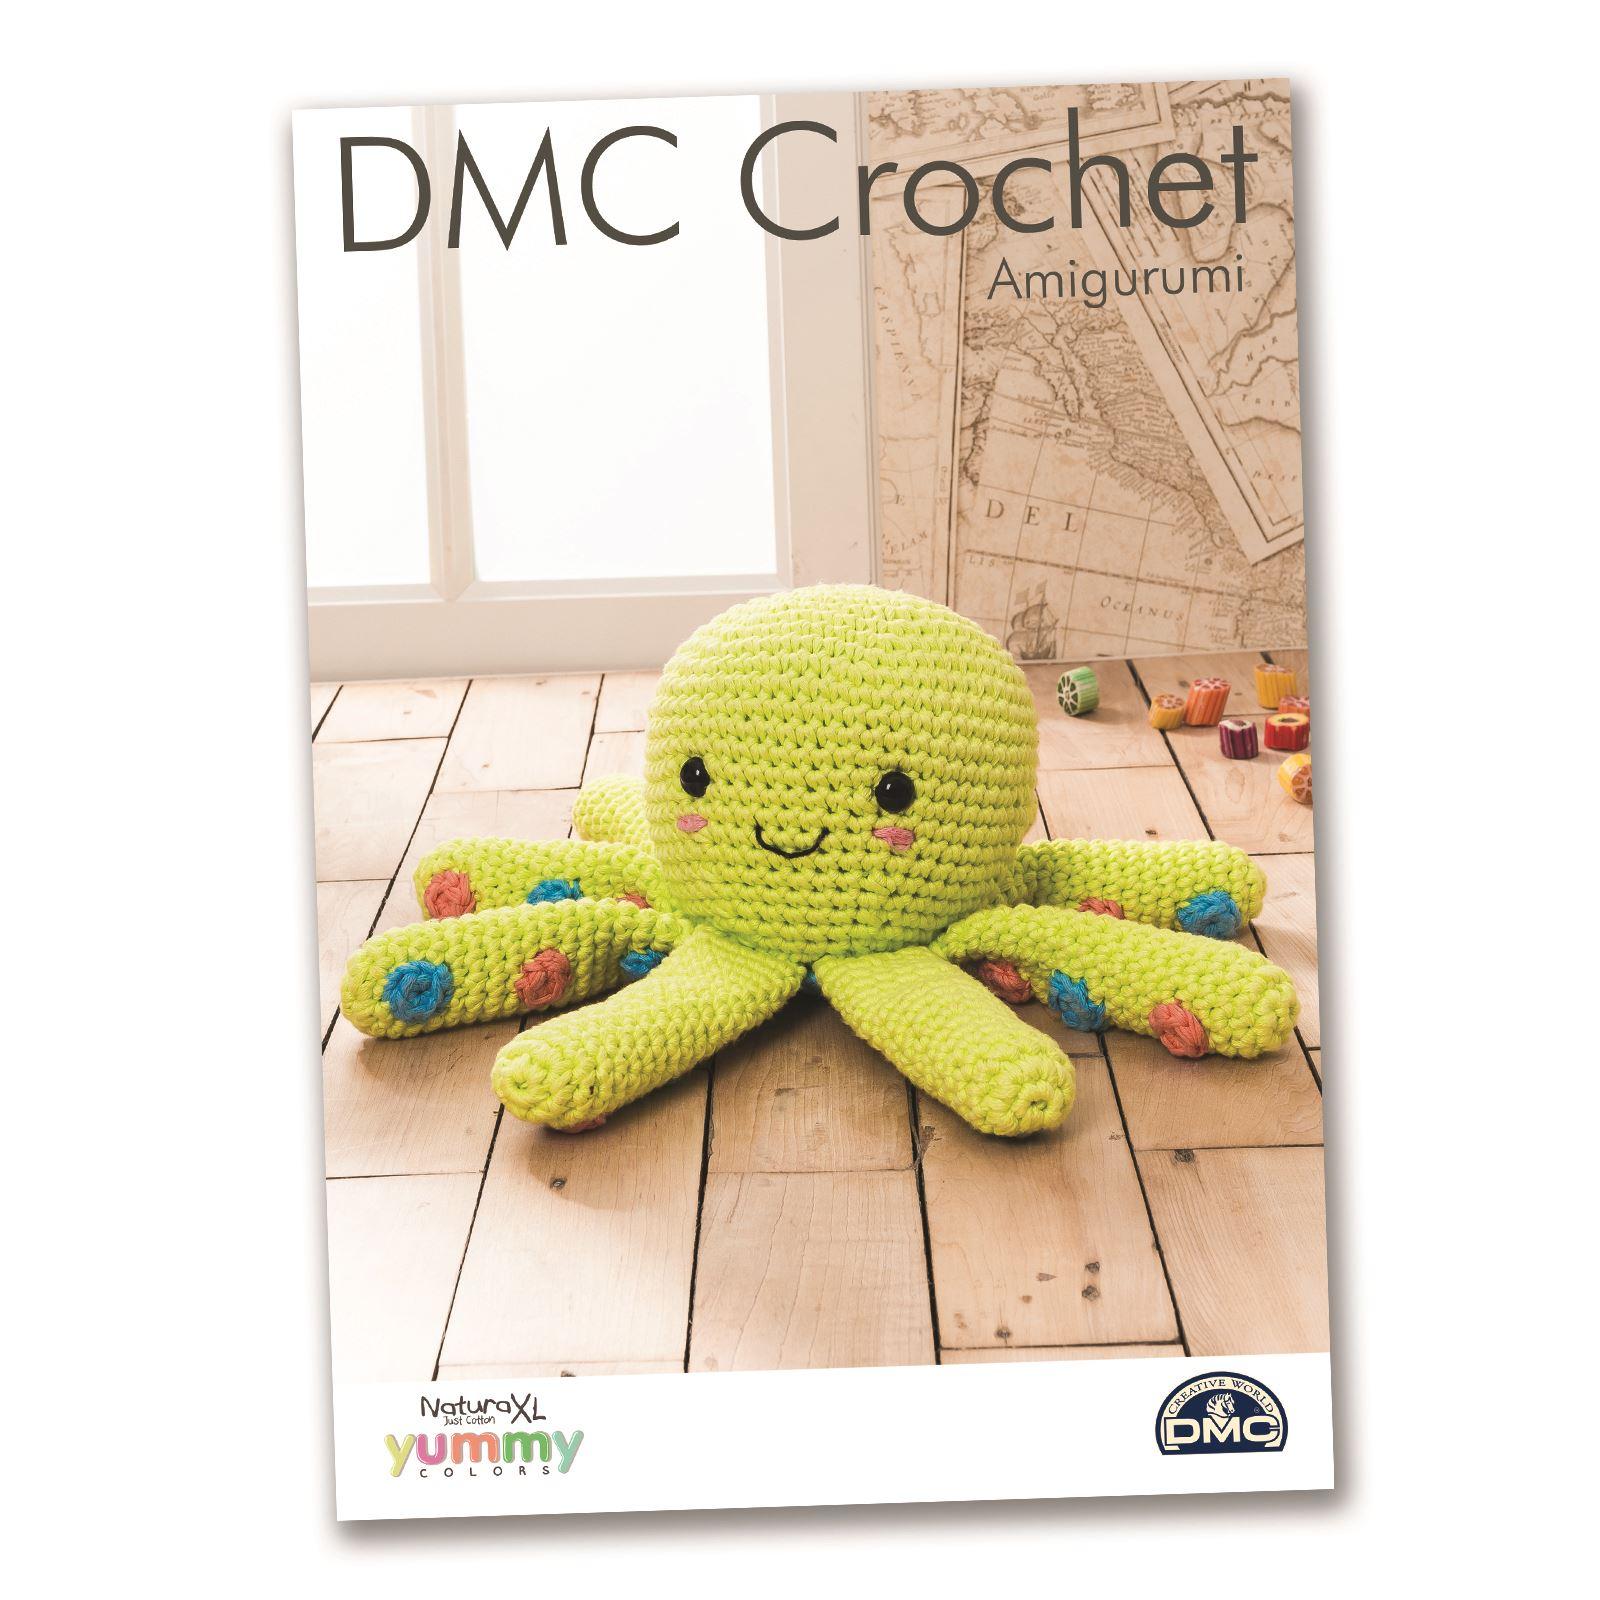 Home Decor Patterns: DMC Natura XL Yummy Crochet Patterns Amigurumi Home Decor